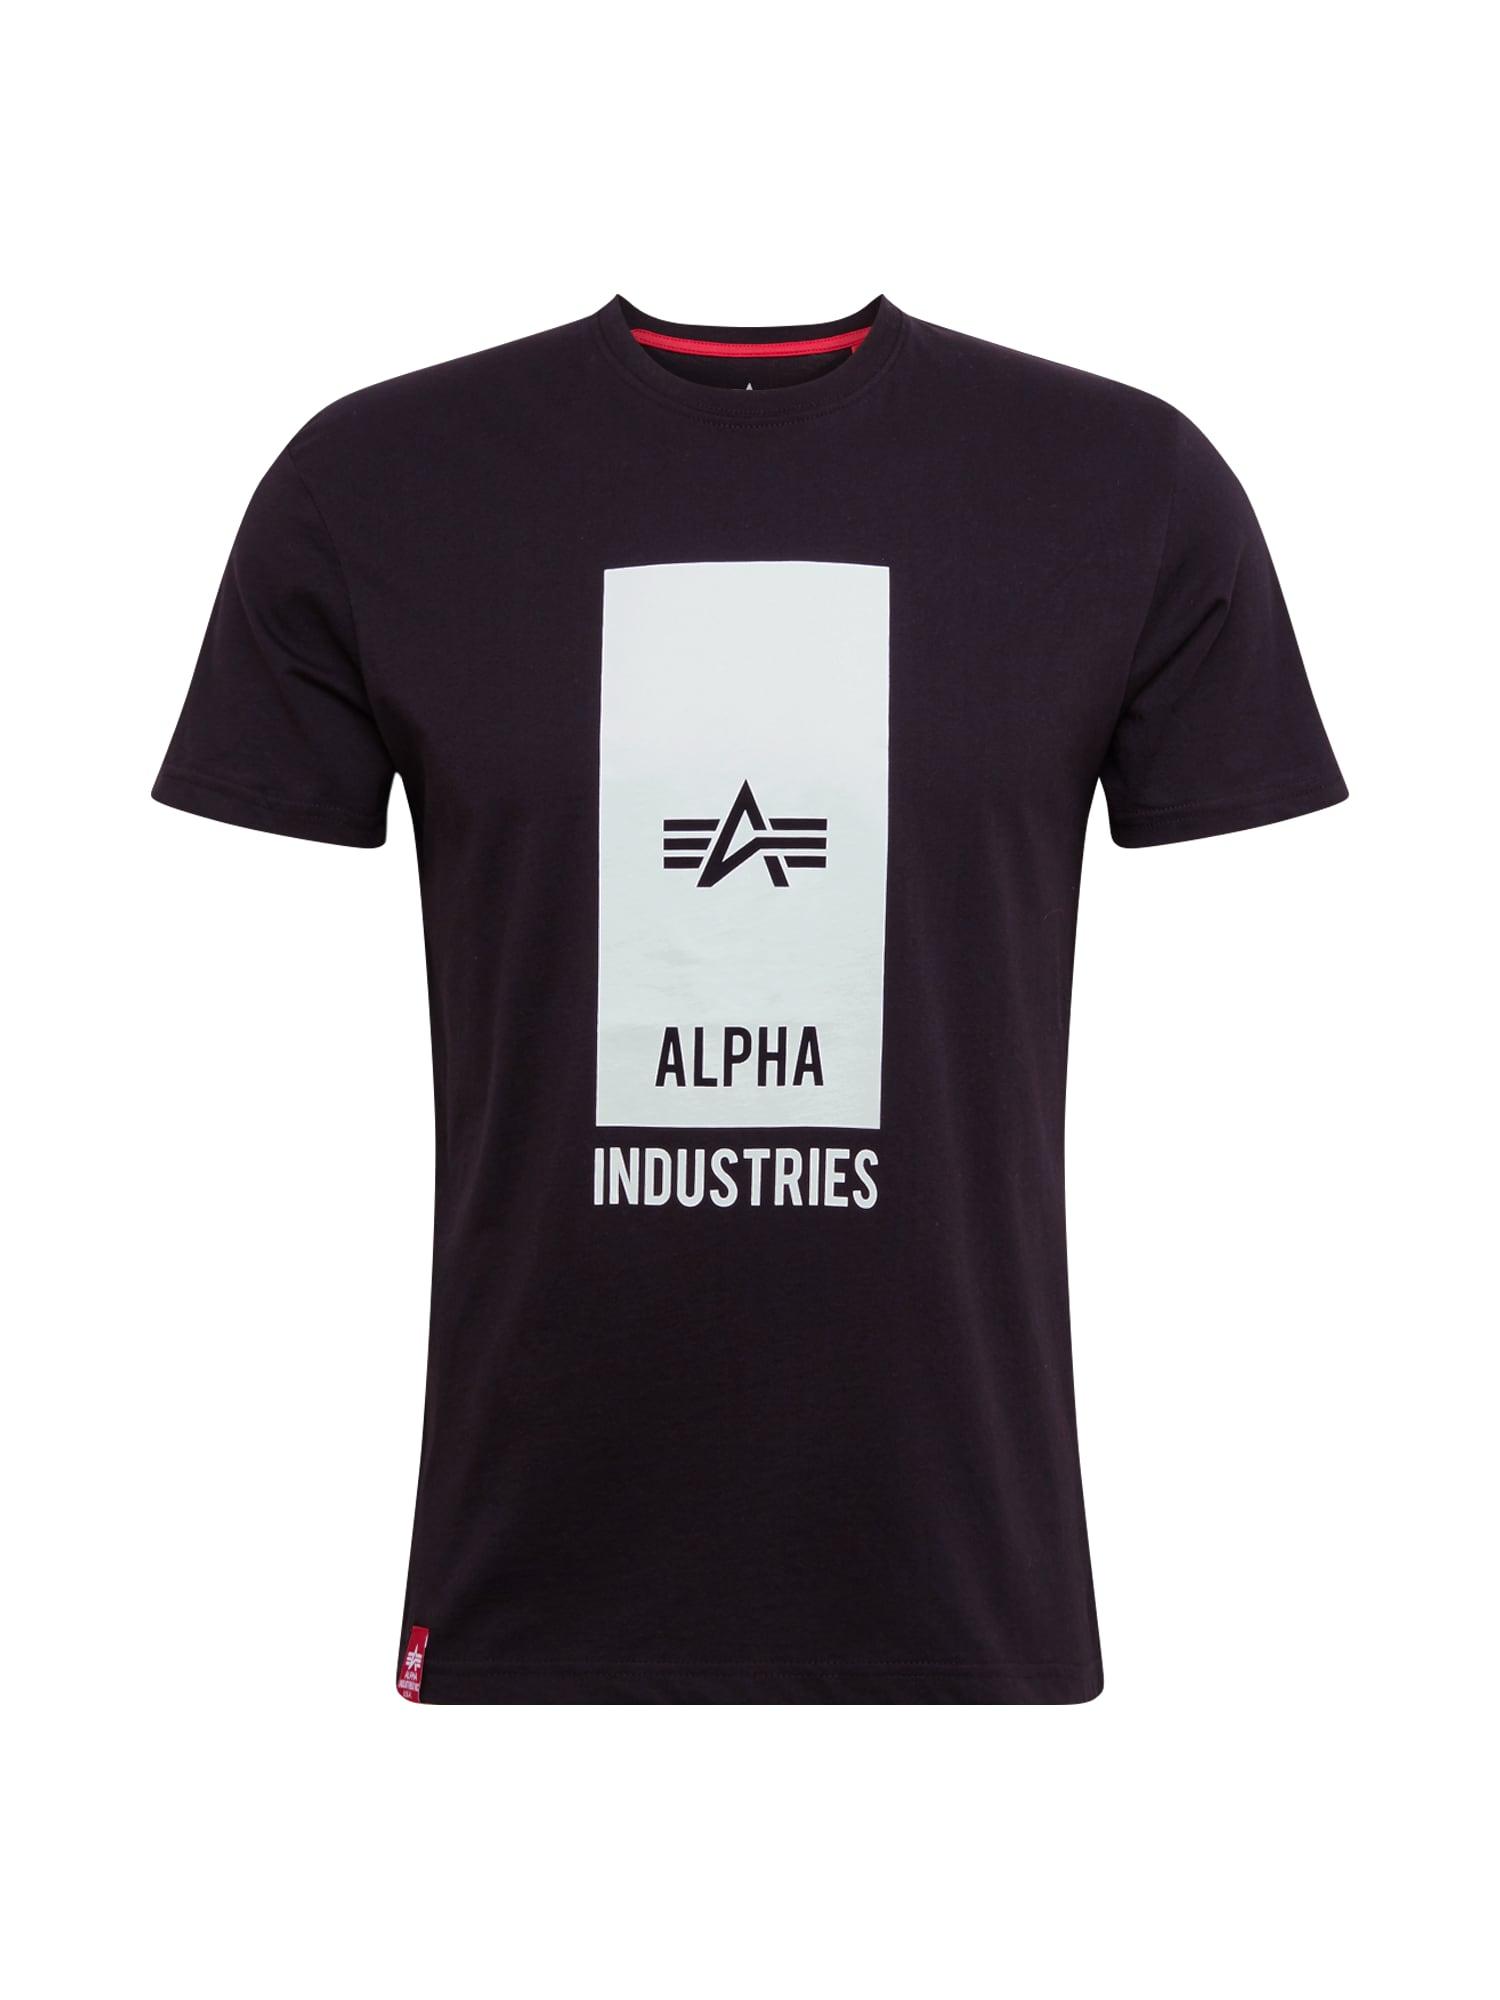 ALPHA INDUSTRIES Marškinėliai juoda / balta / pilka